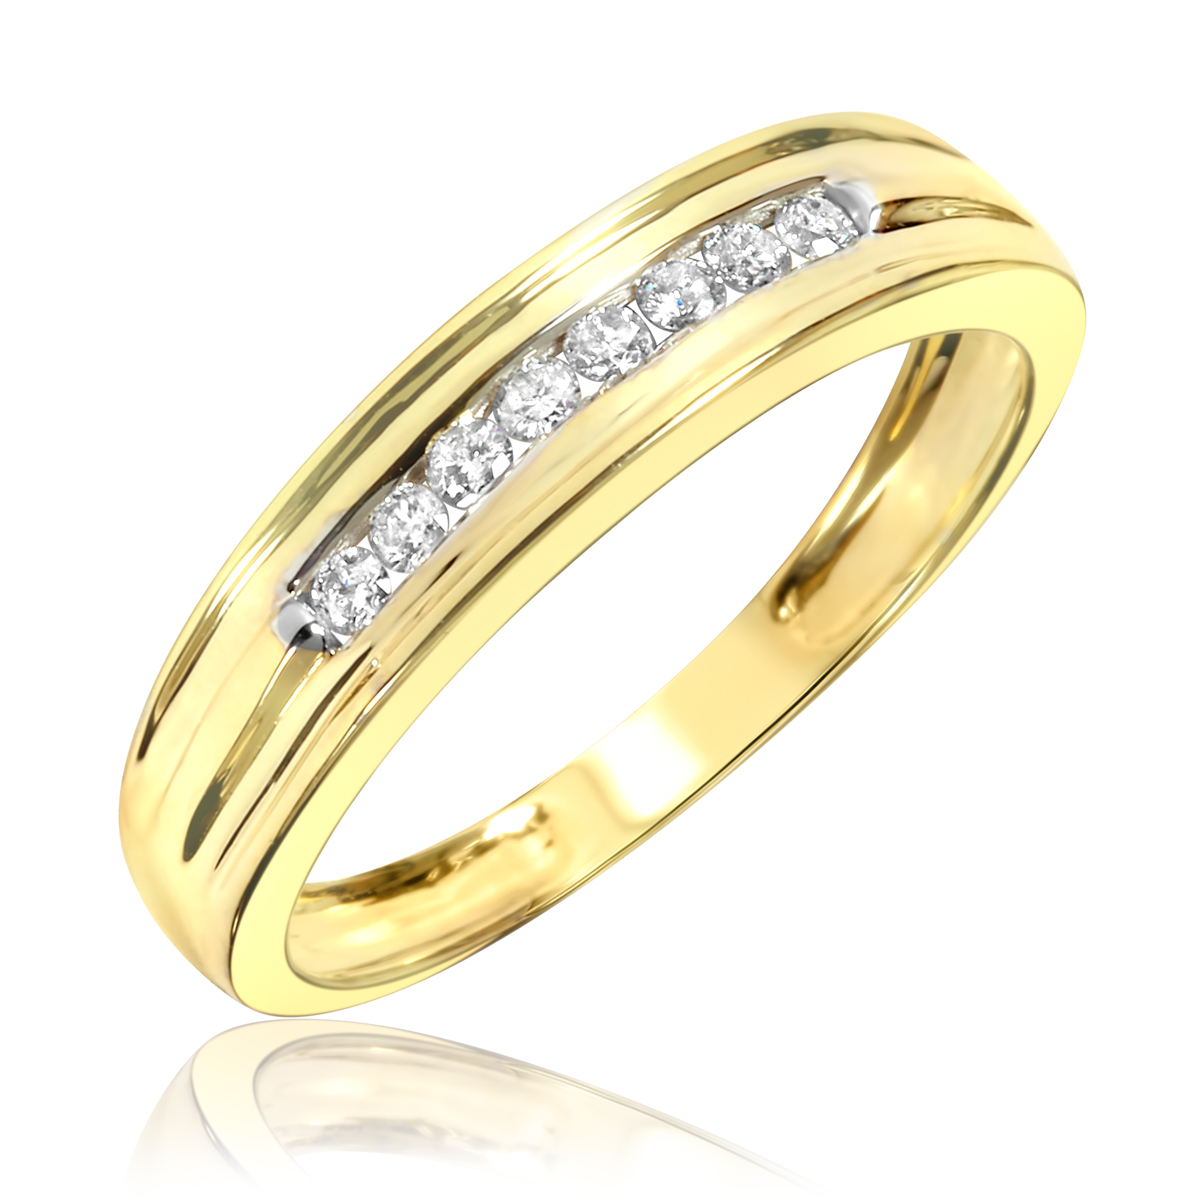 1/7 CT. T.W. Round Cut Diamond Ladies Wedding Band 10K Yellow Gold- Size 8